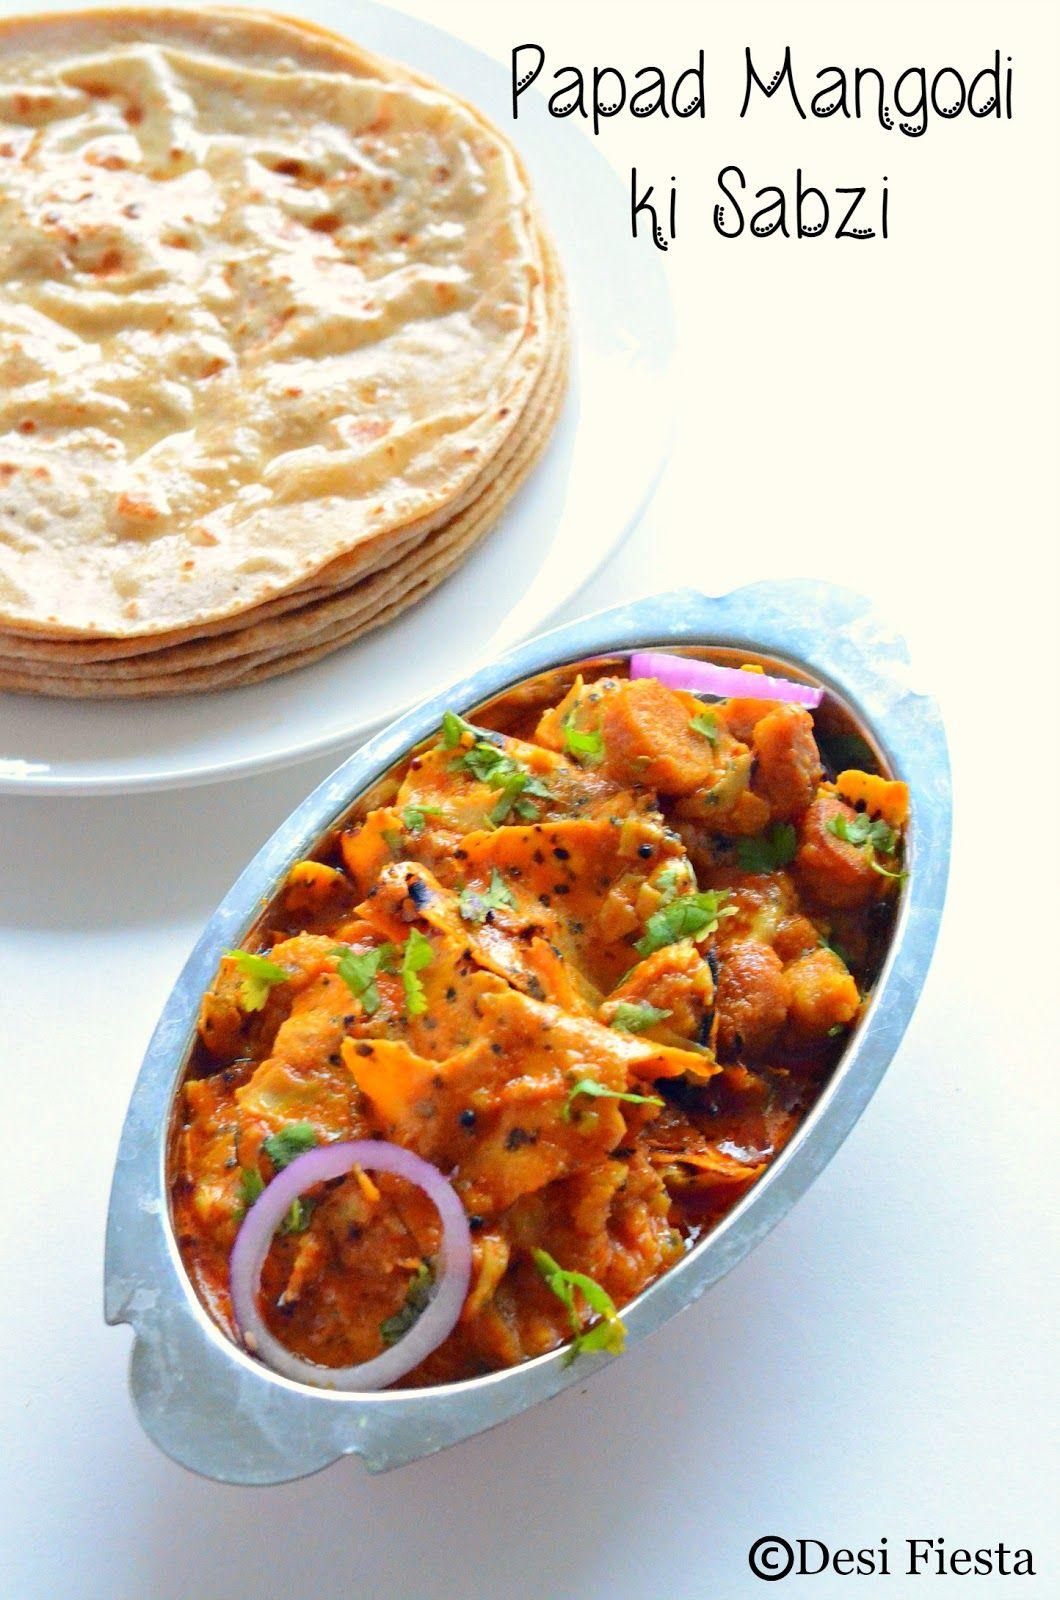 Papad mangodi ki sabzi rajasthani cuisine pinterest cuisine papad mangodi ki sabzi rajasthani foodrajasthani forumfinder Image collections